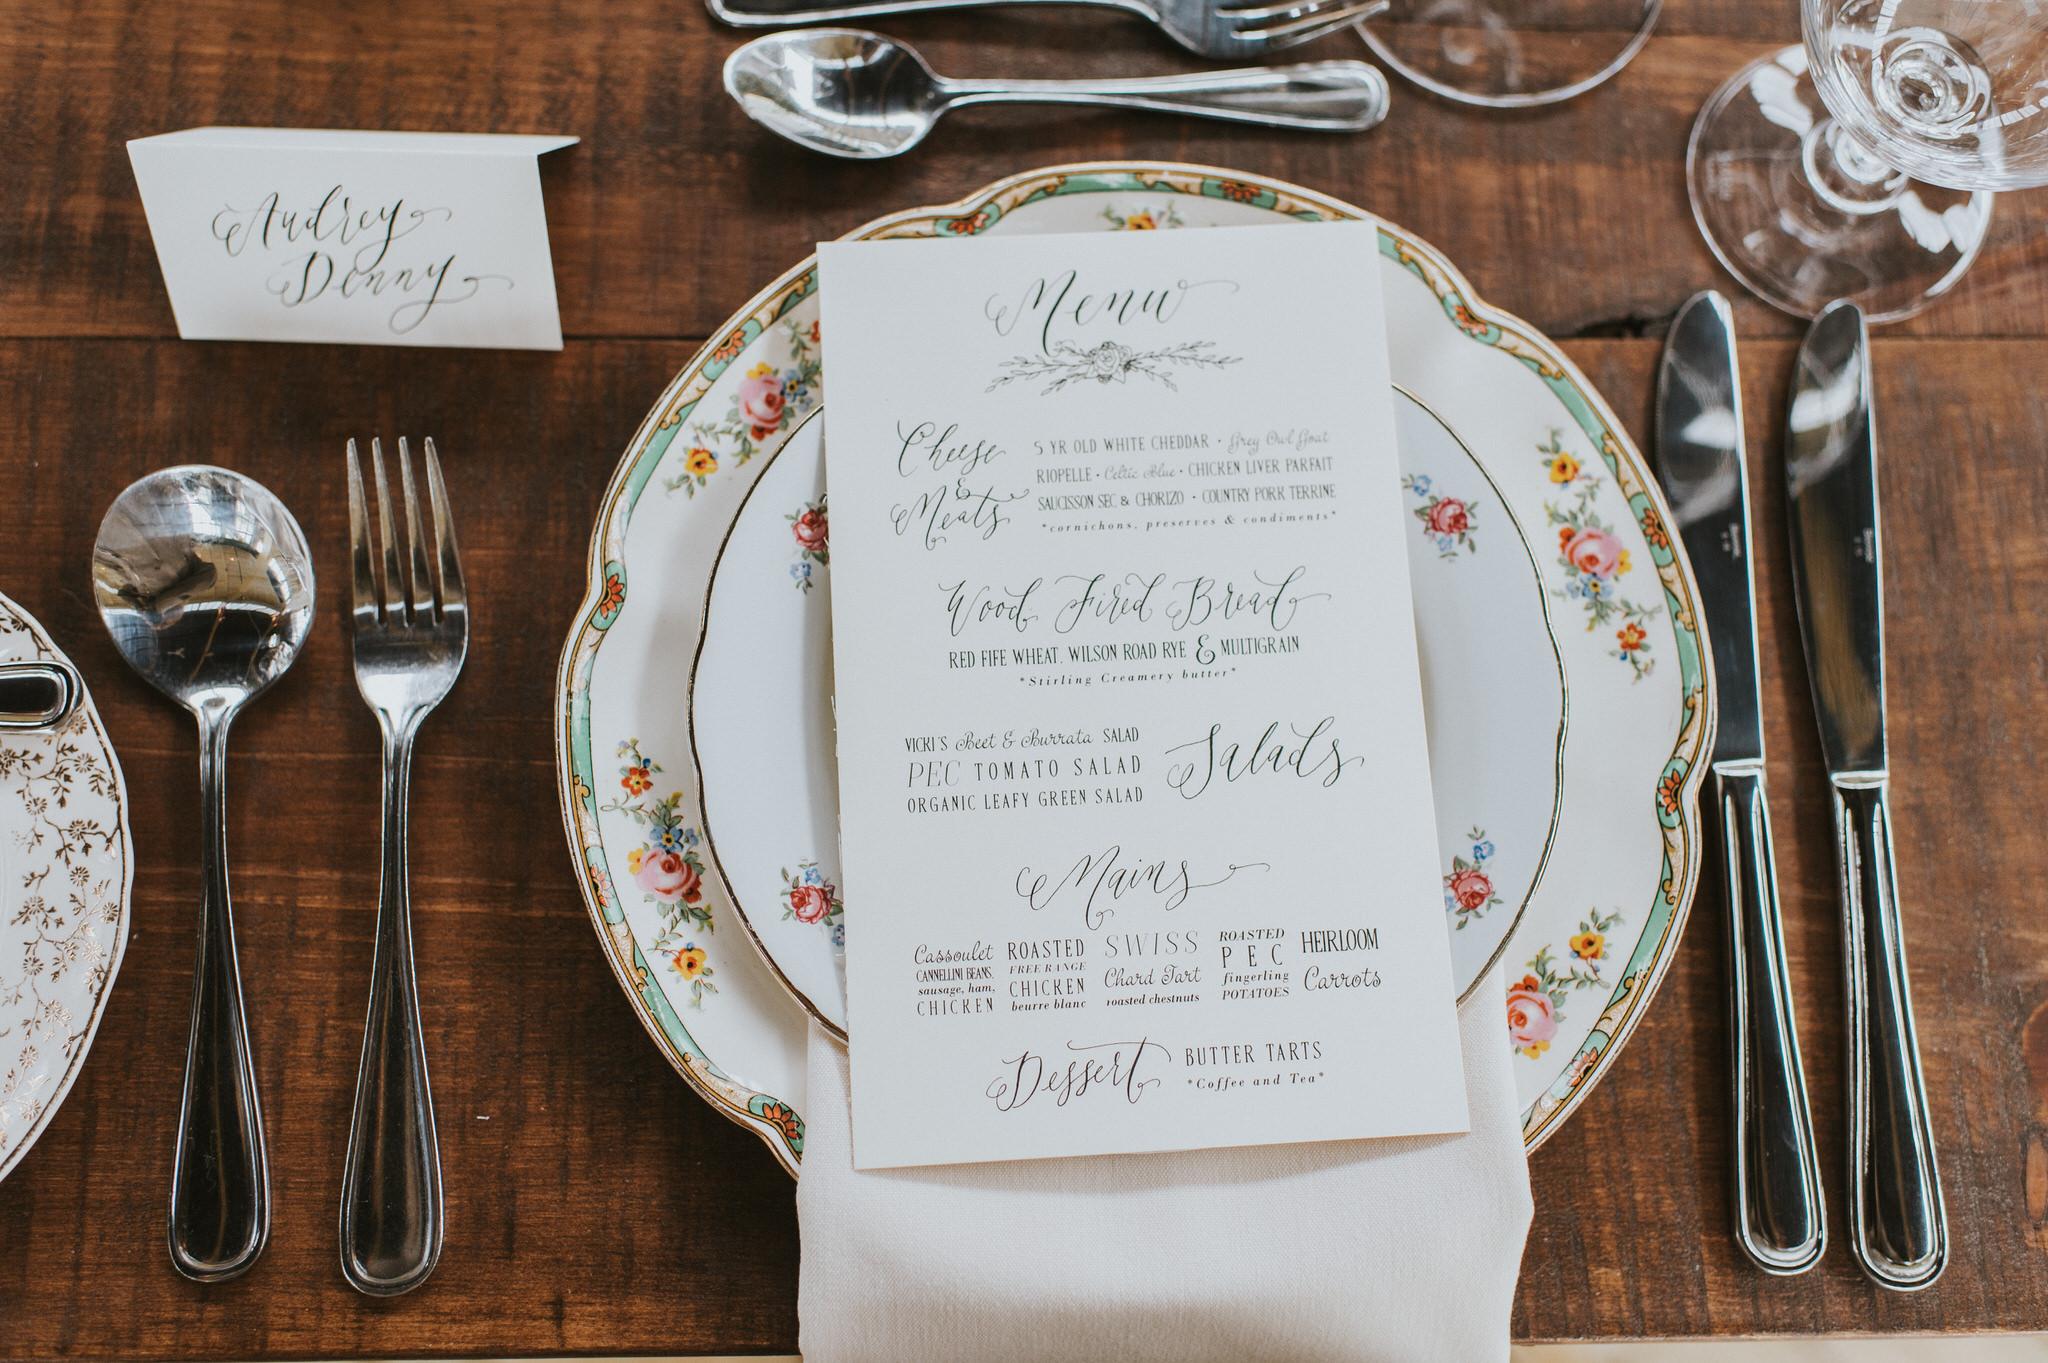 scarletoneillphotography_weddingphotography_prince edward county weddings085.JPG